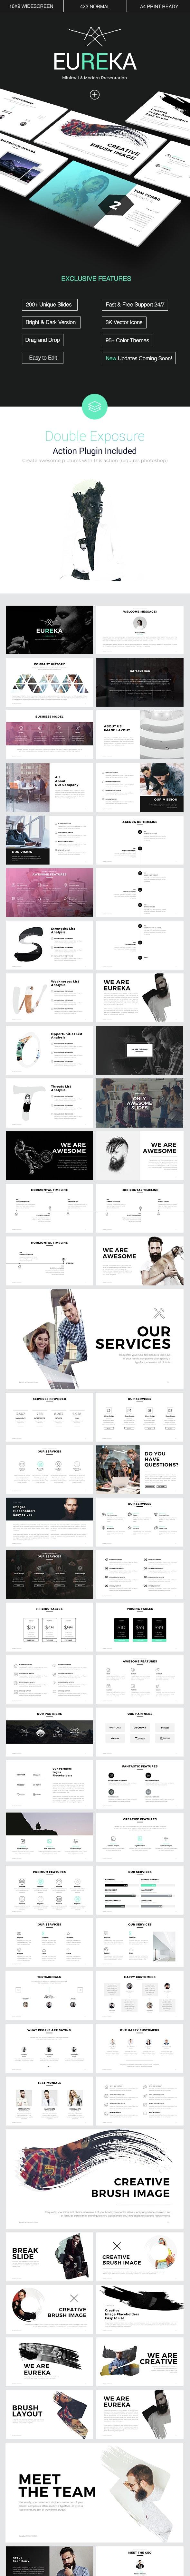 Eureka - Minimal PowerPoint Template - Business PowerPoint Templates